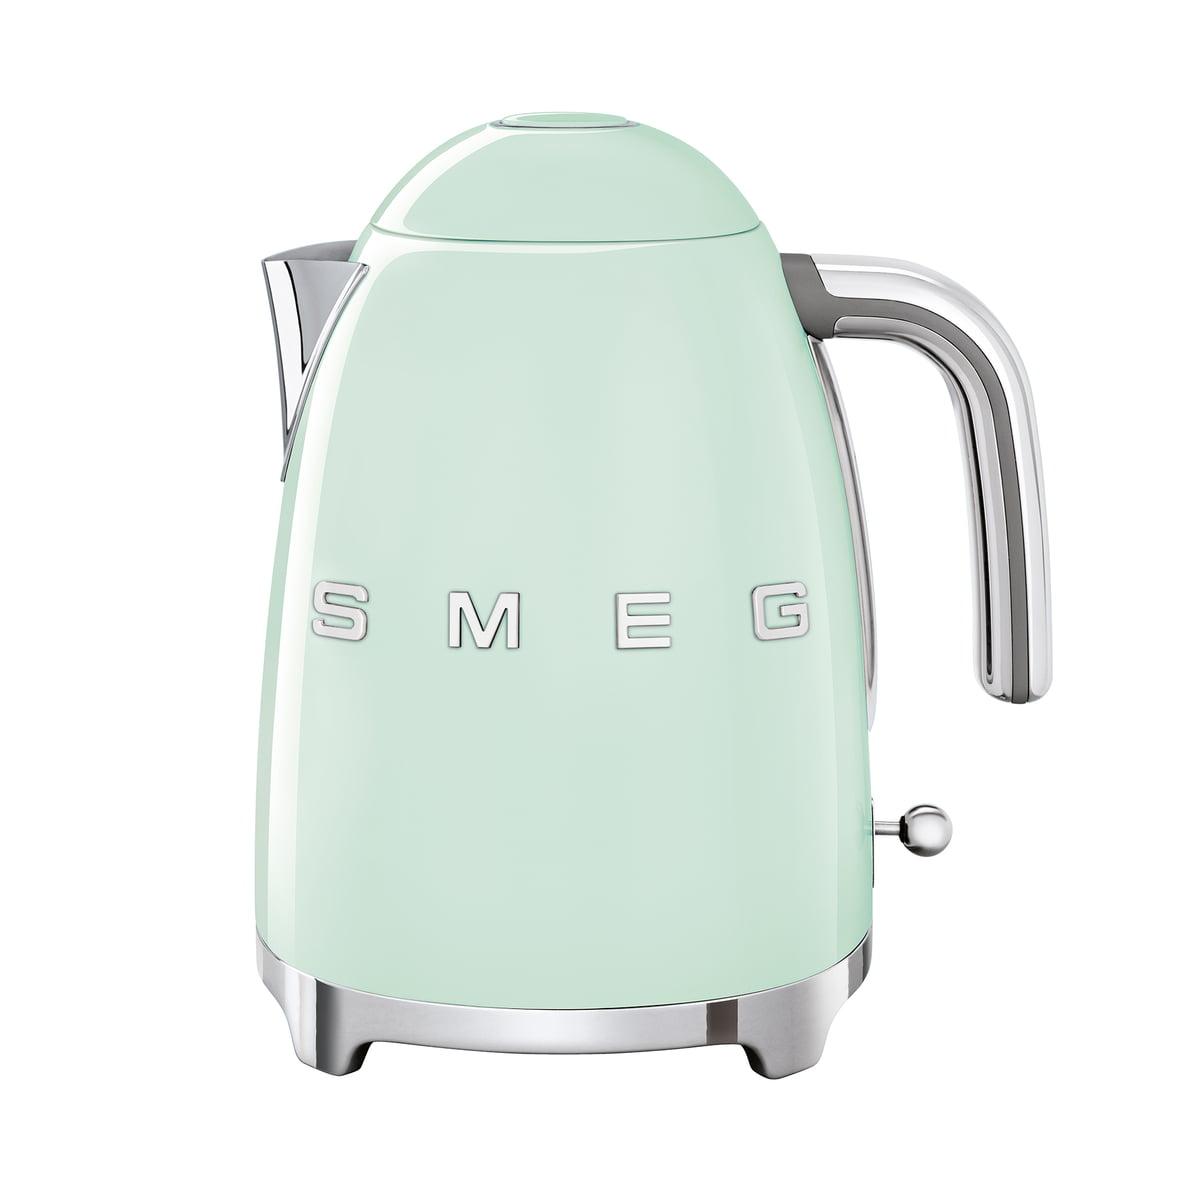 SMEG - Wasserkocher 1,7 l (KLF03), pastellgrün